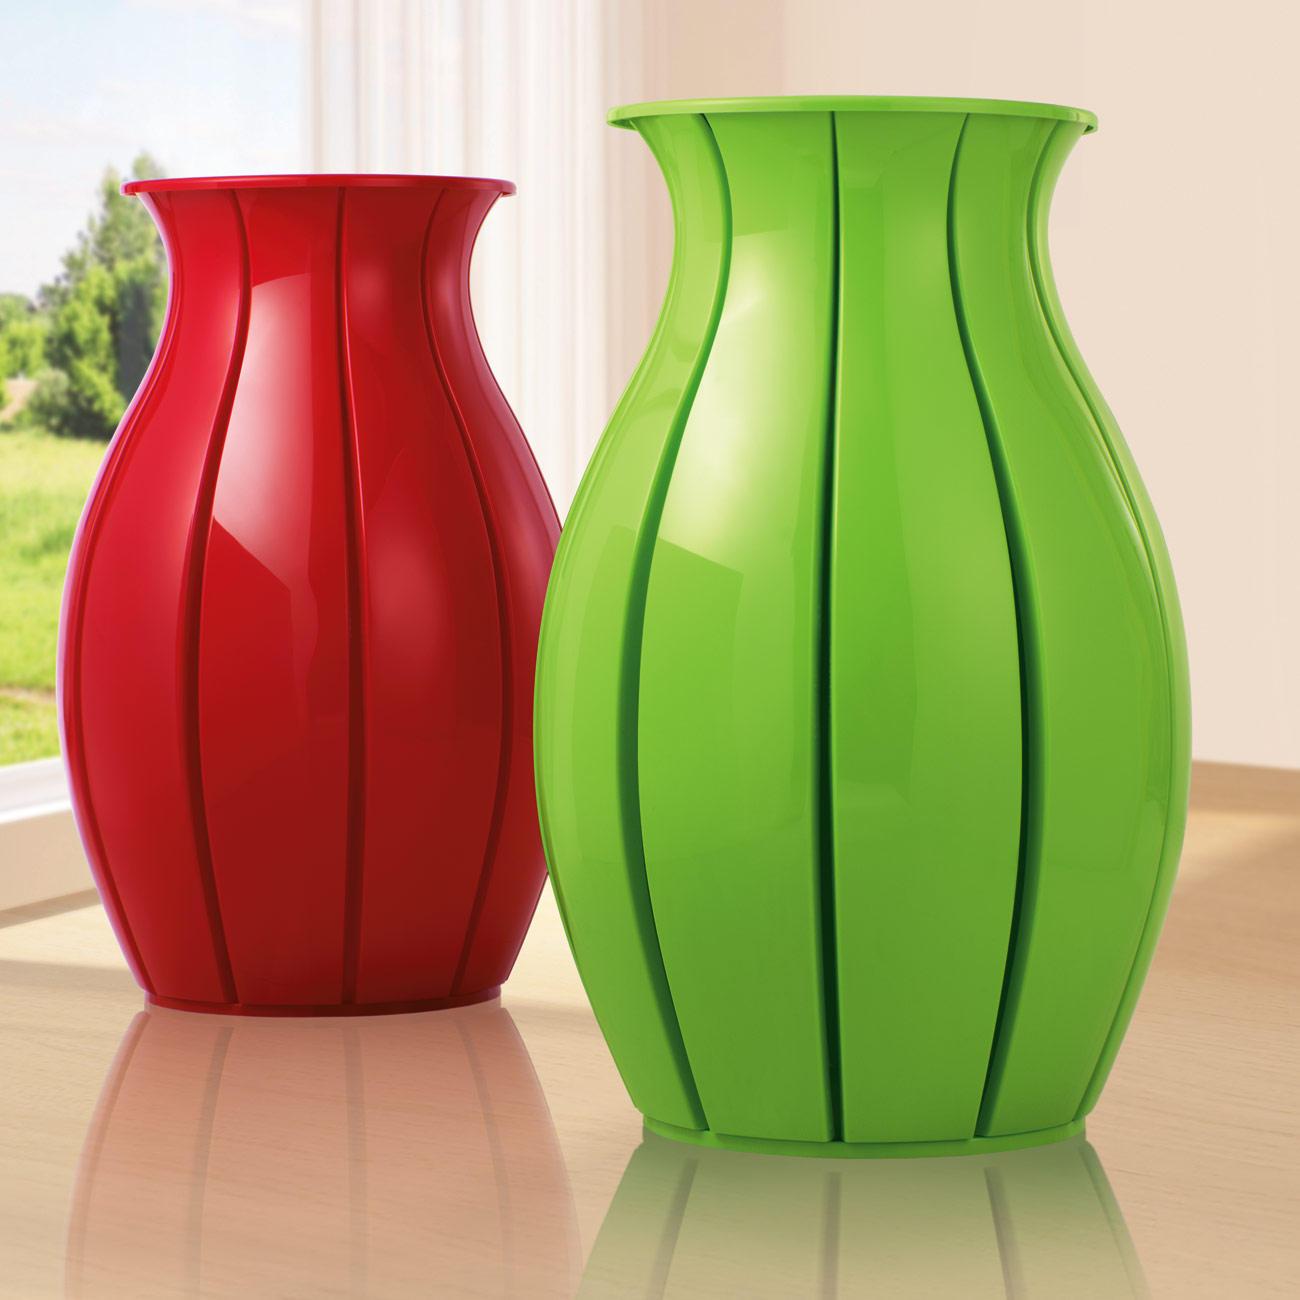 guzzini ninfea w schekorb amphora gr n online kaufen. Black Bedroom Furniture Sets. Home Design Ideas